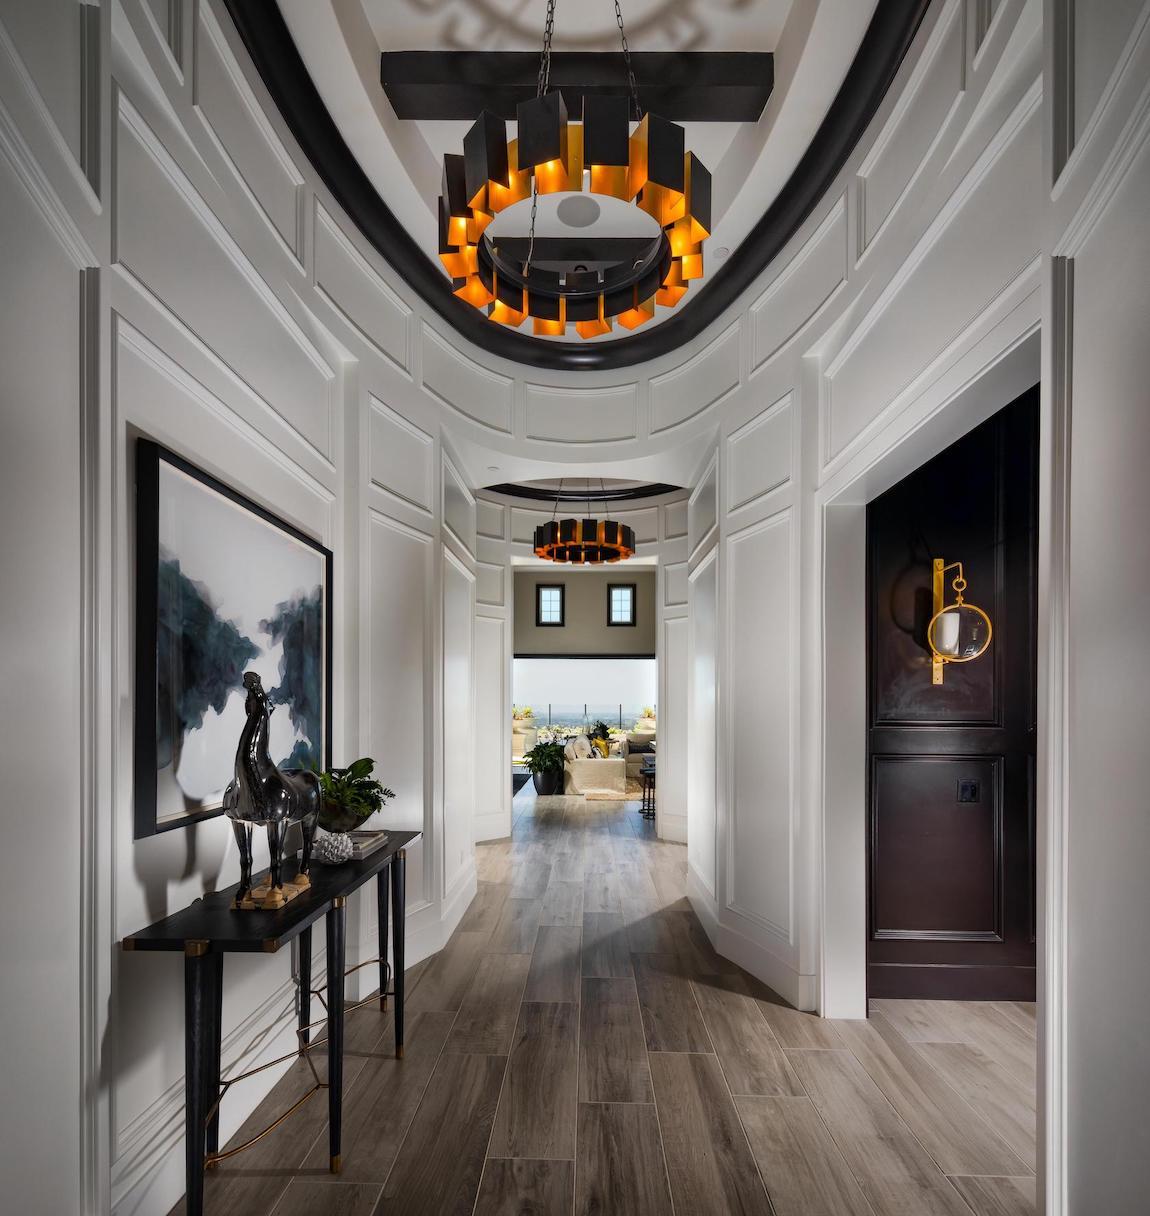 Modern metallic pendant lighting in entryway